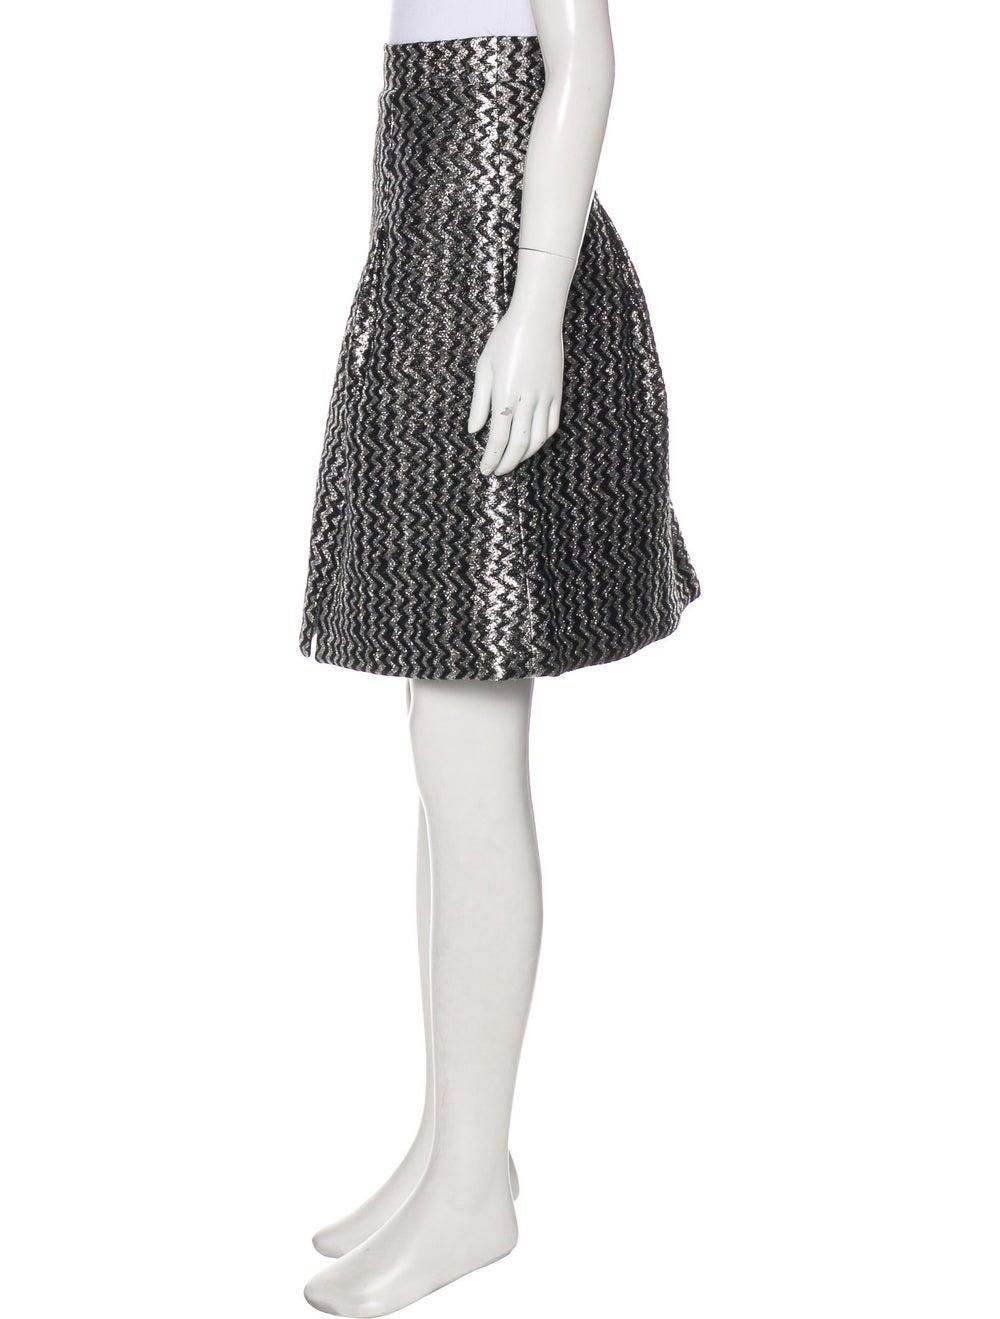 Chanel 2017 Metallic Skirt Silver - image 2